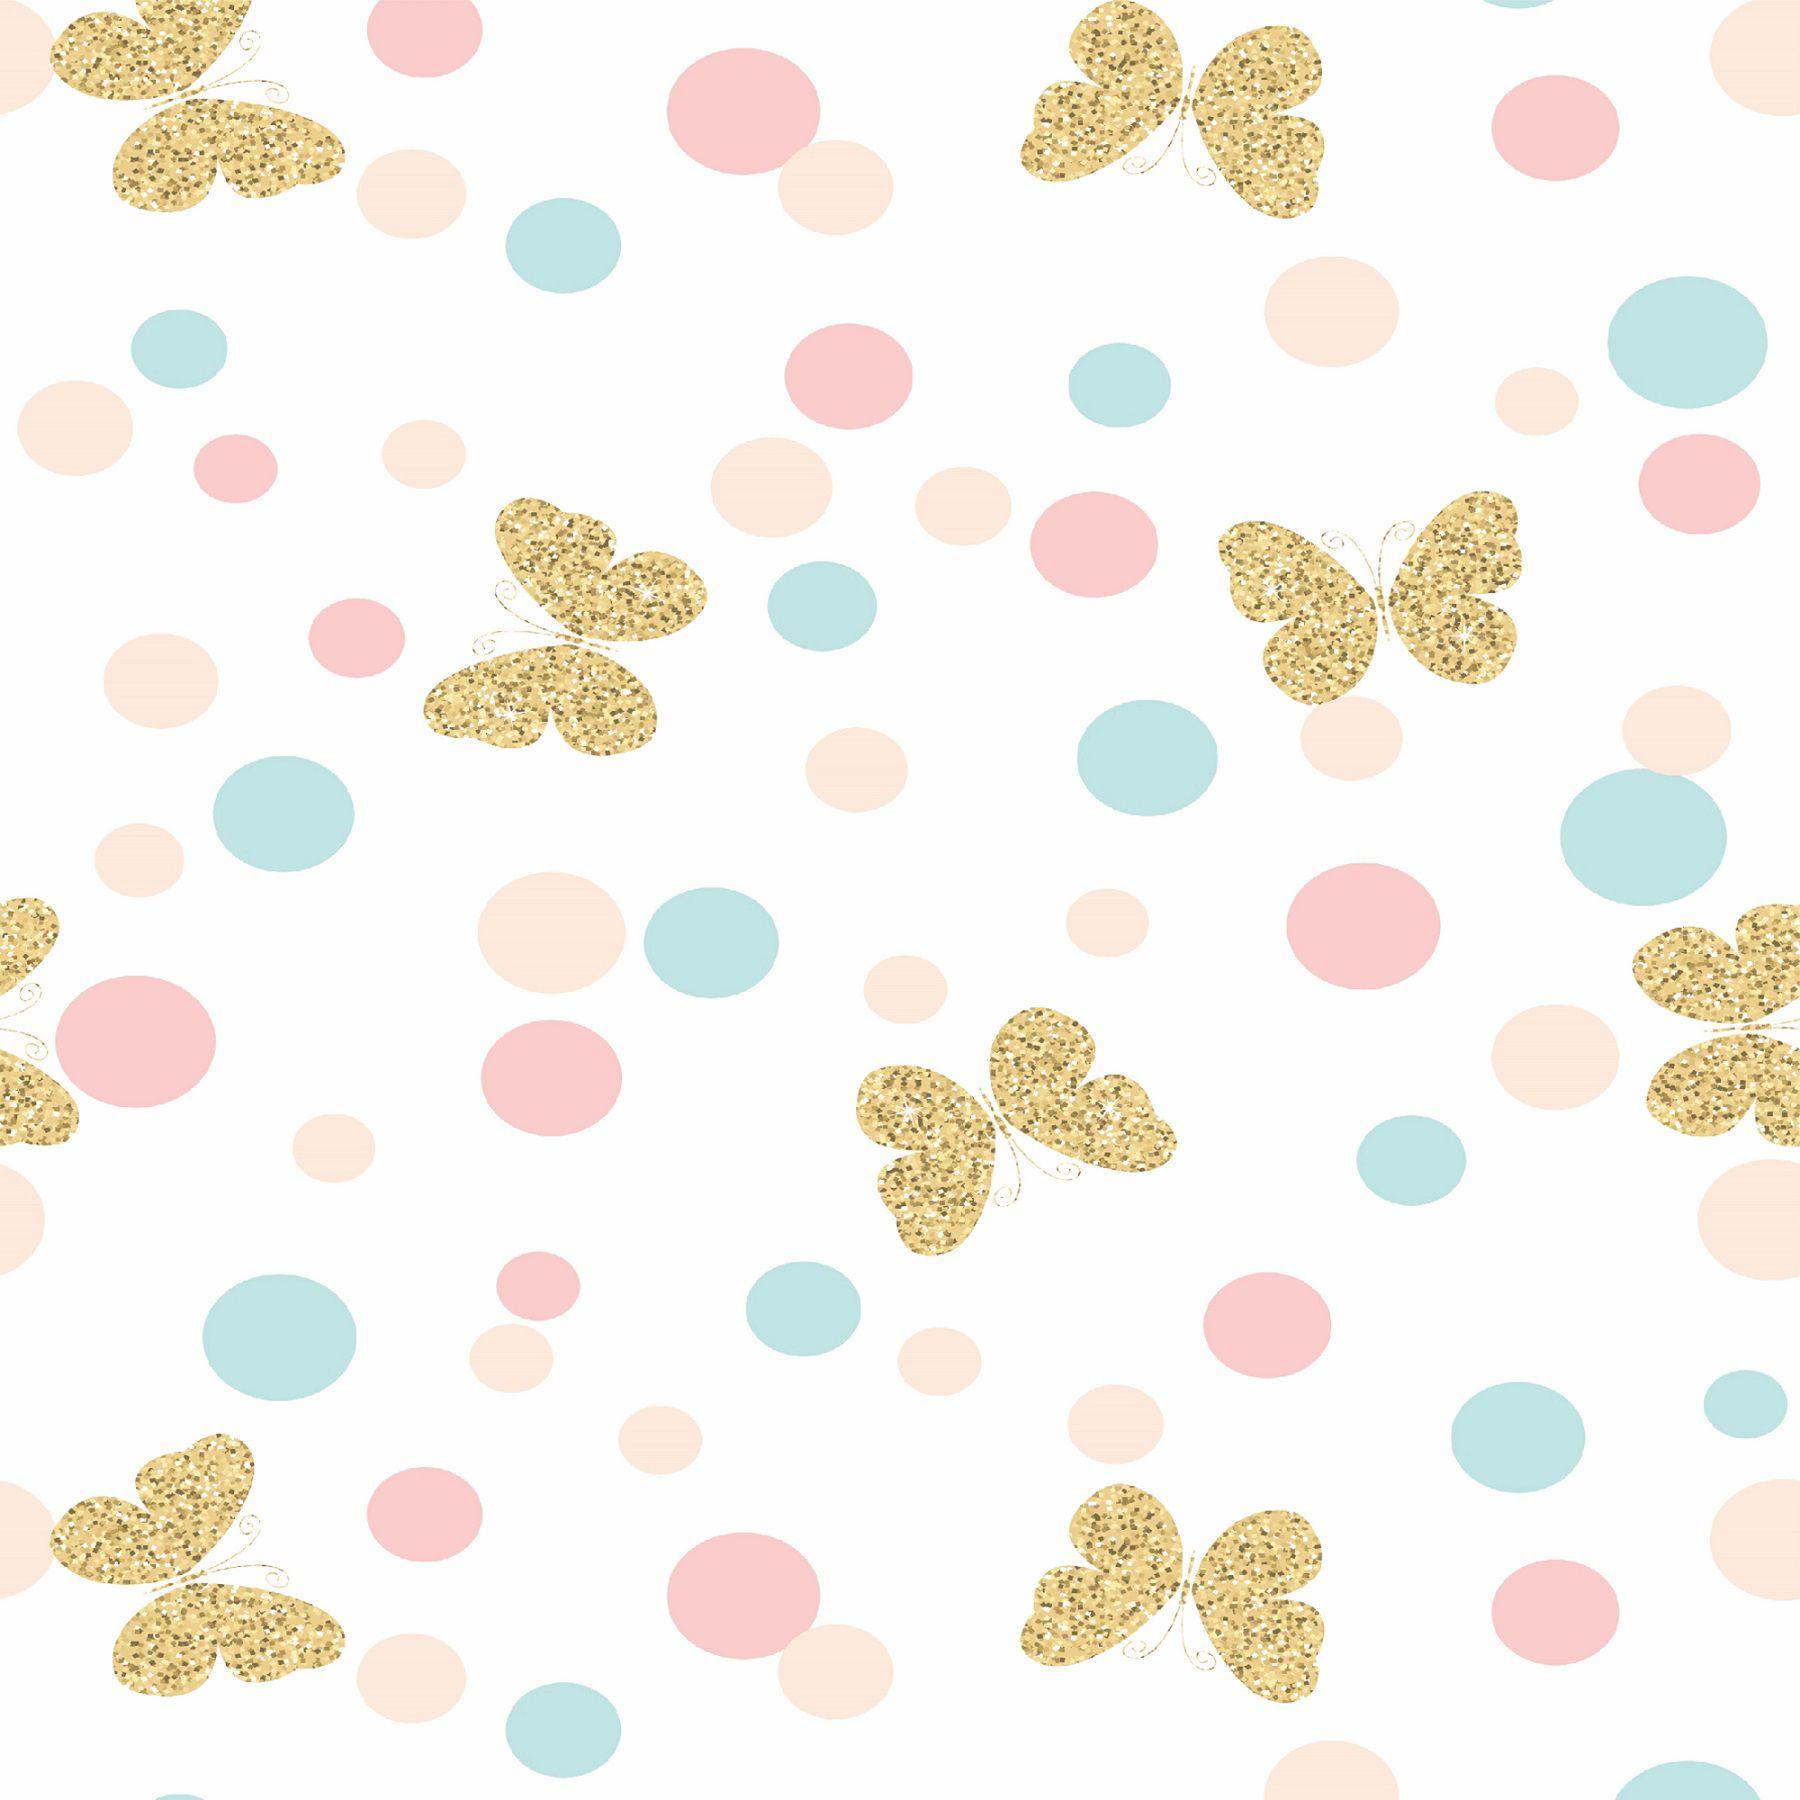 Papel de Parede Adesivo Lavável Infantil Borboletas Dourado - Cole Aí